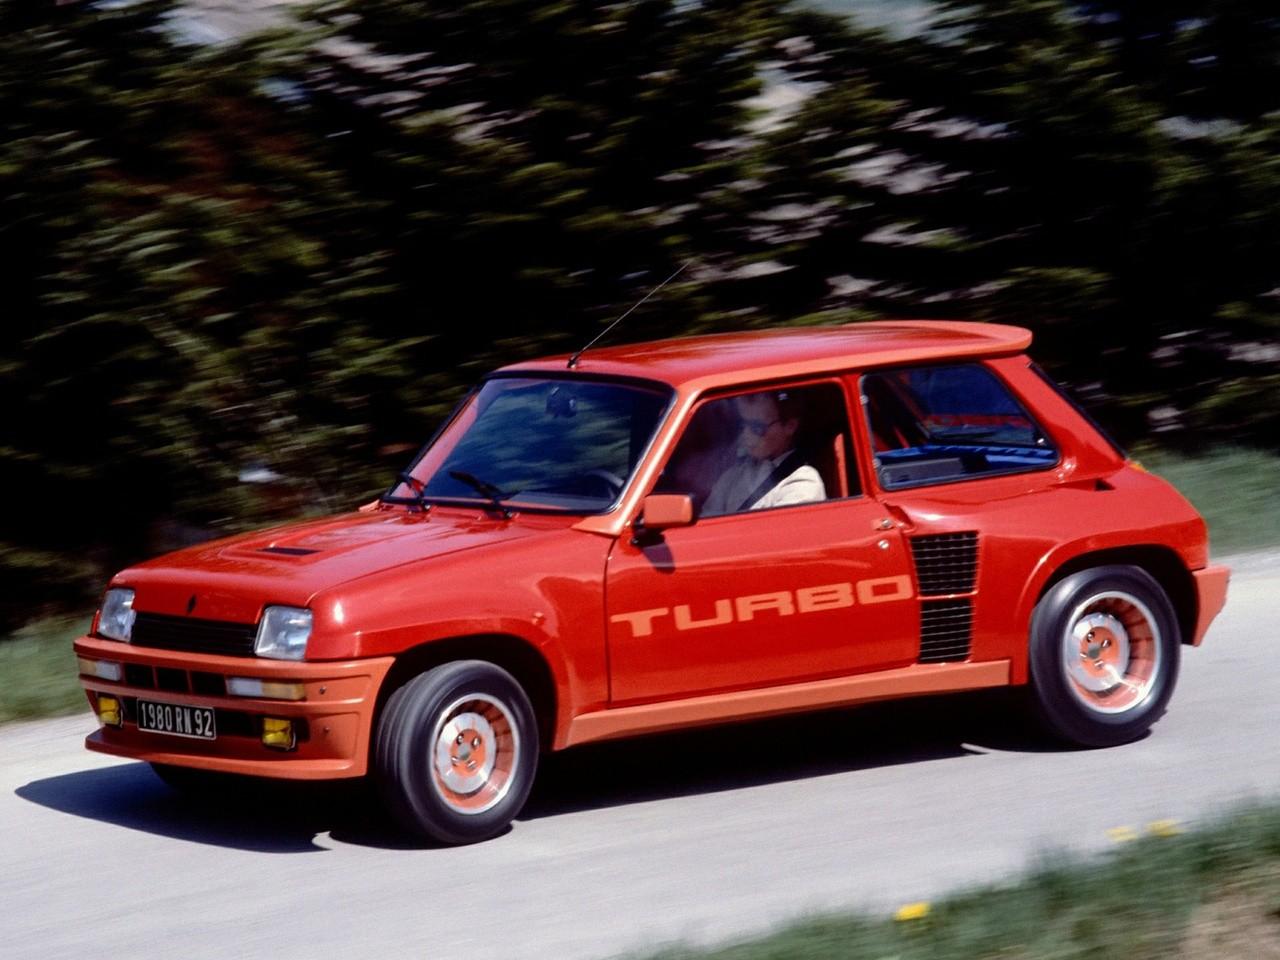 renault 5 turbo specs photos 1980 1981 1982 1983 1984 autoevolution. Black Bedroom Furniture Sets. Home Design Ideas